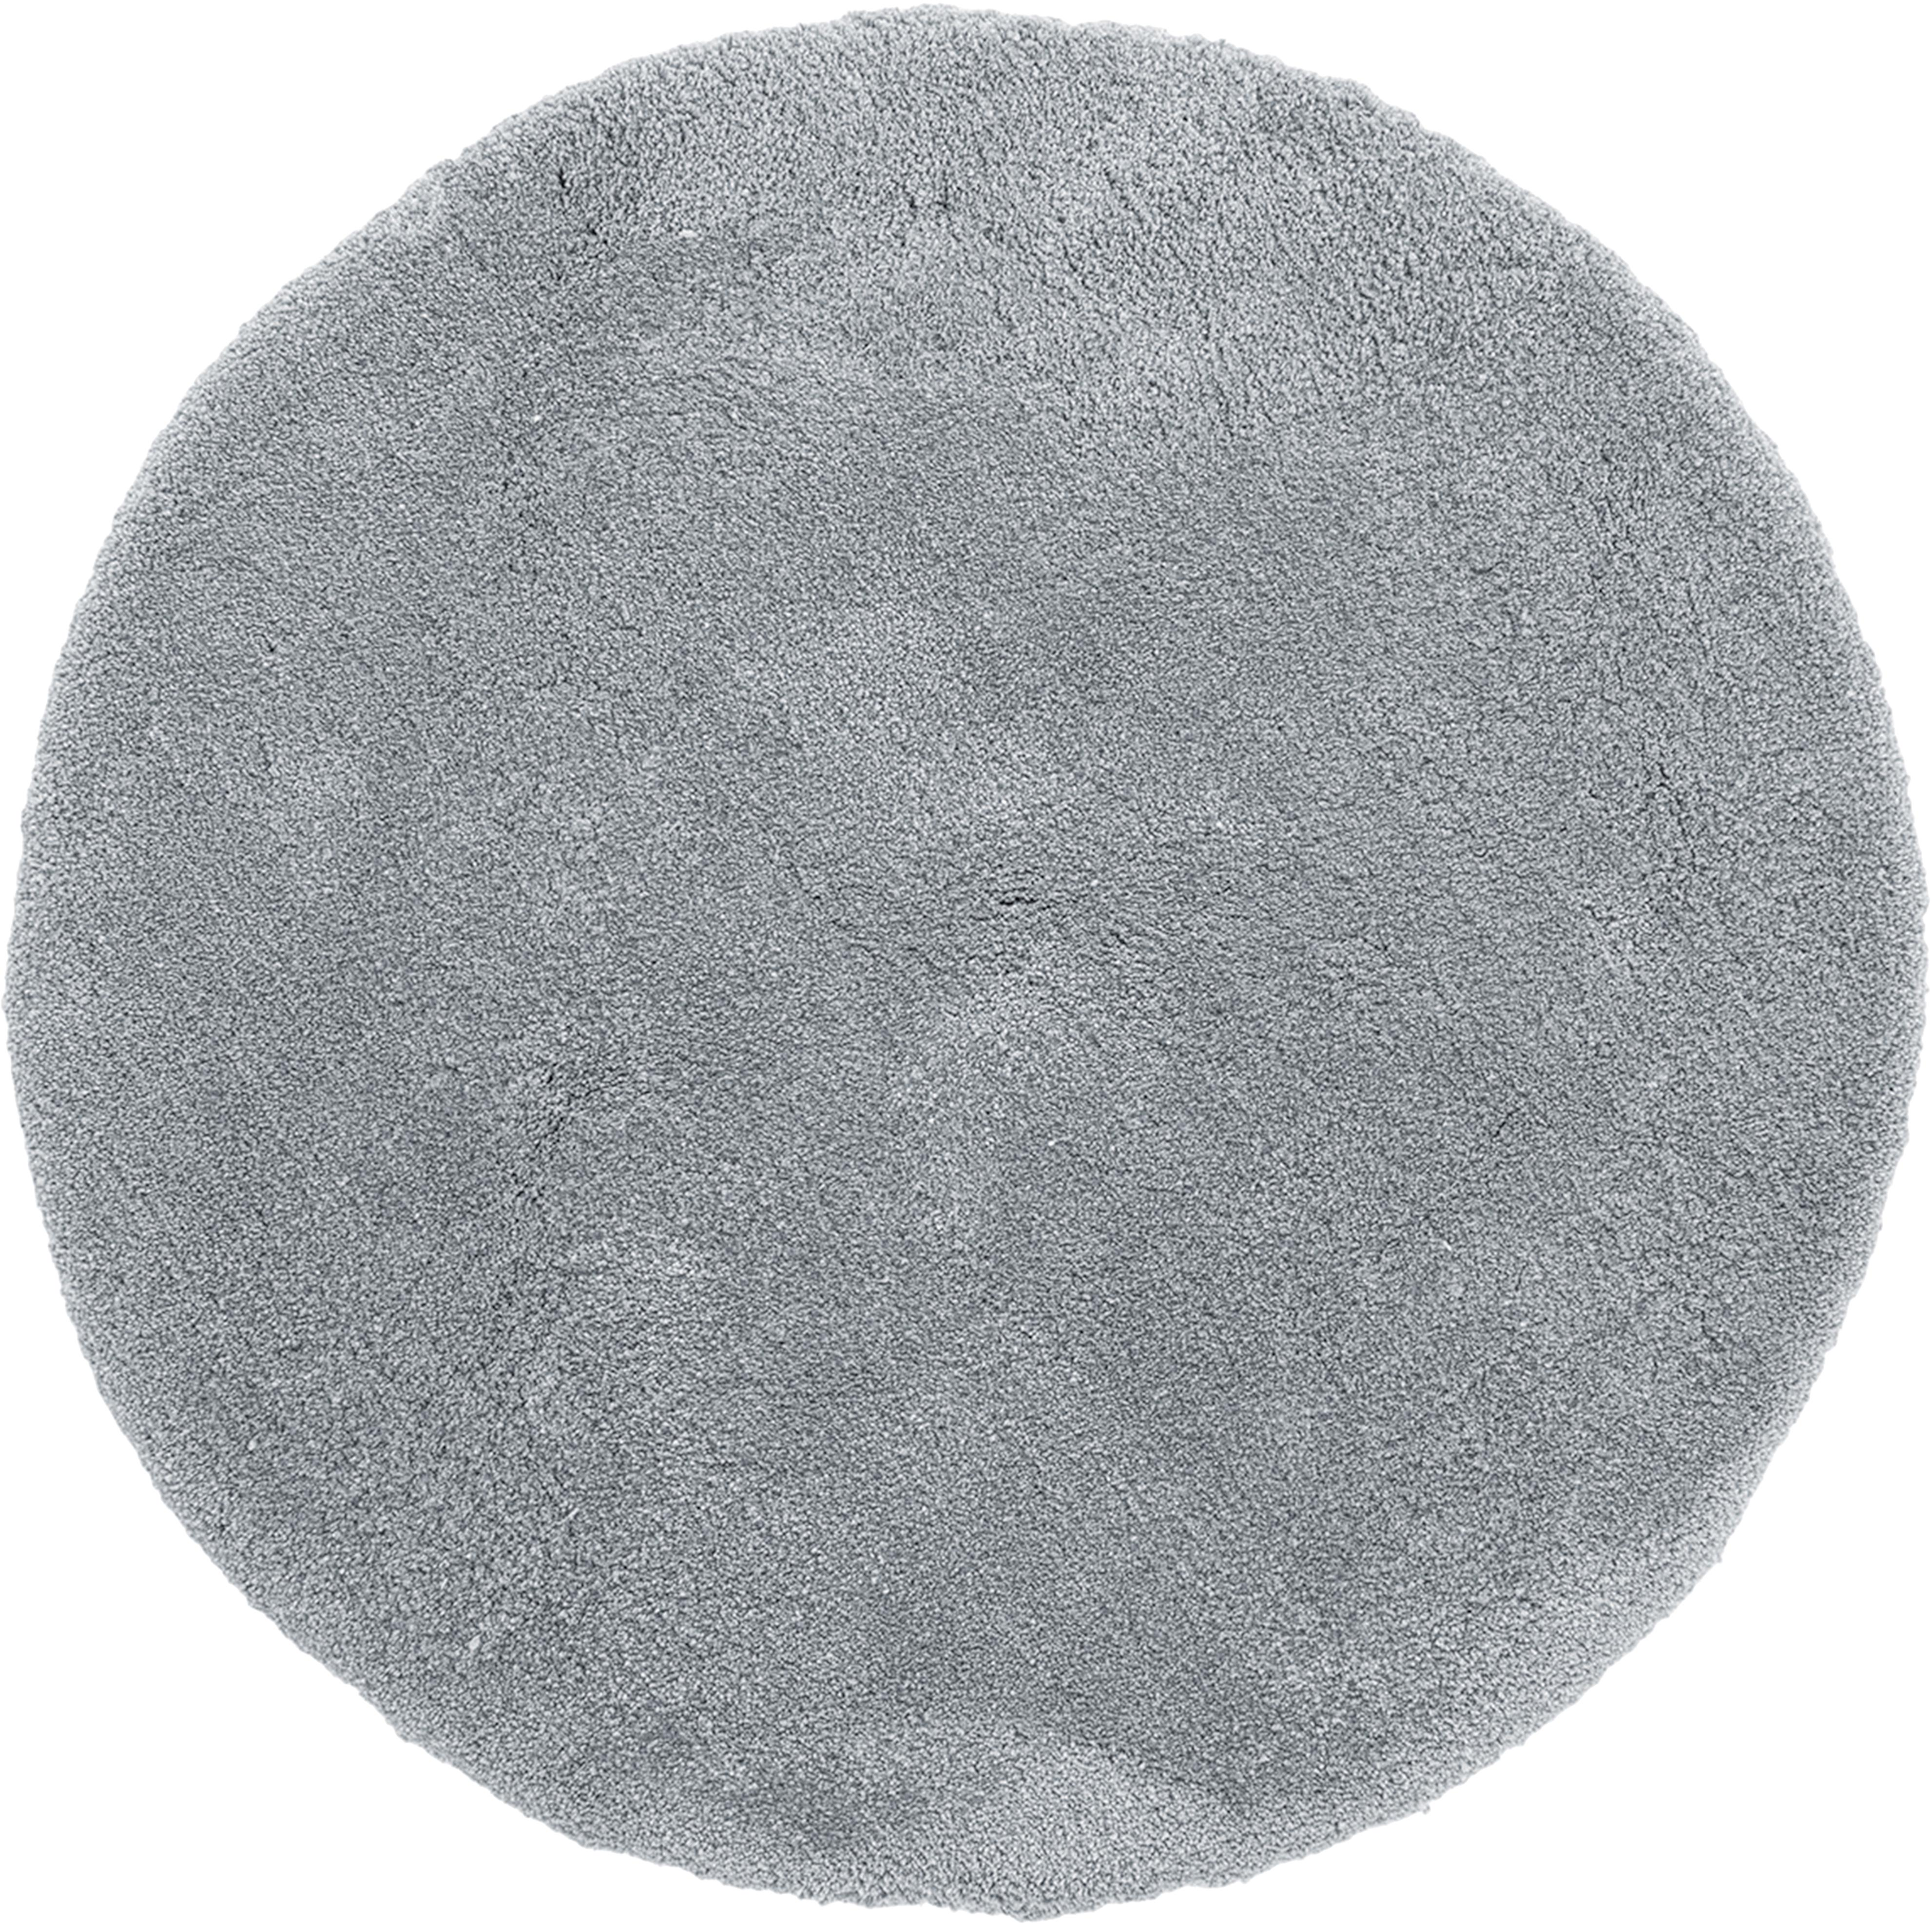 Alfombra redonda de pelo largo Leighton, Parte superior: 100%poliéster (microfibr, Reverso: 100%poliéster, Gris oscuro, Ø 120 cm (Tamaño S)